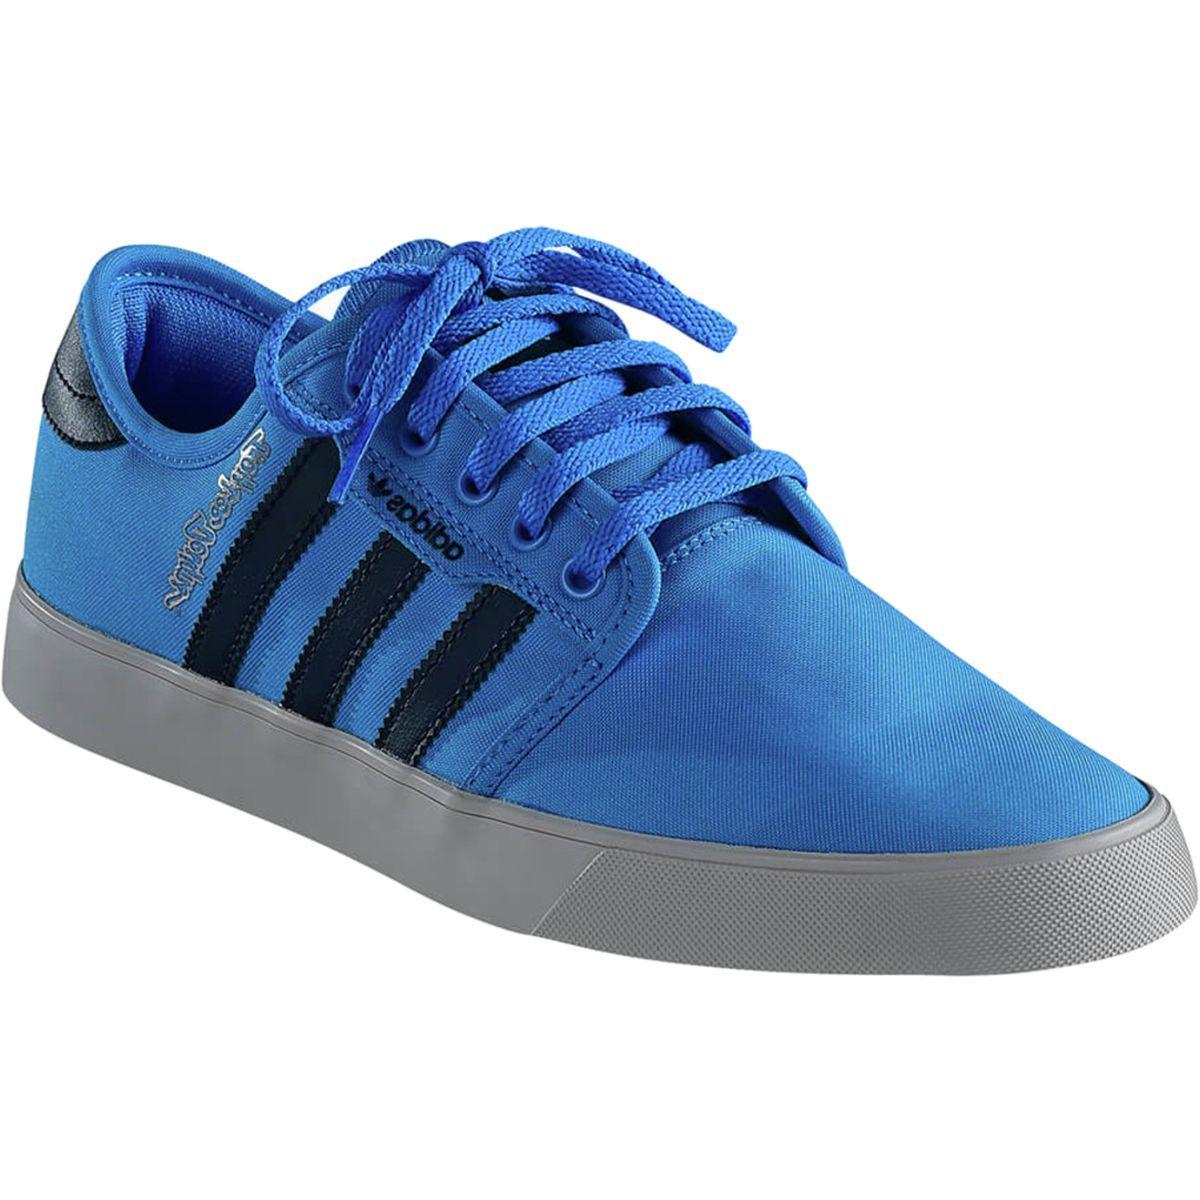 Troy Lee Designs Team TLD Adidas Shoe - Men's